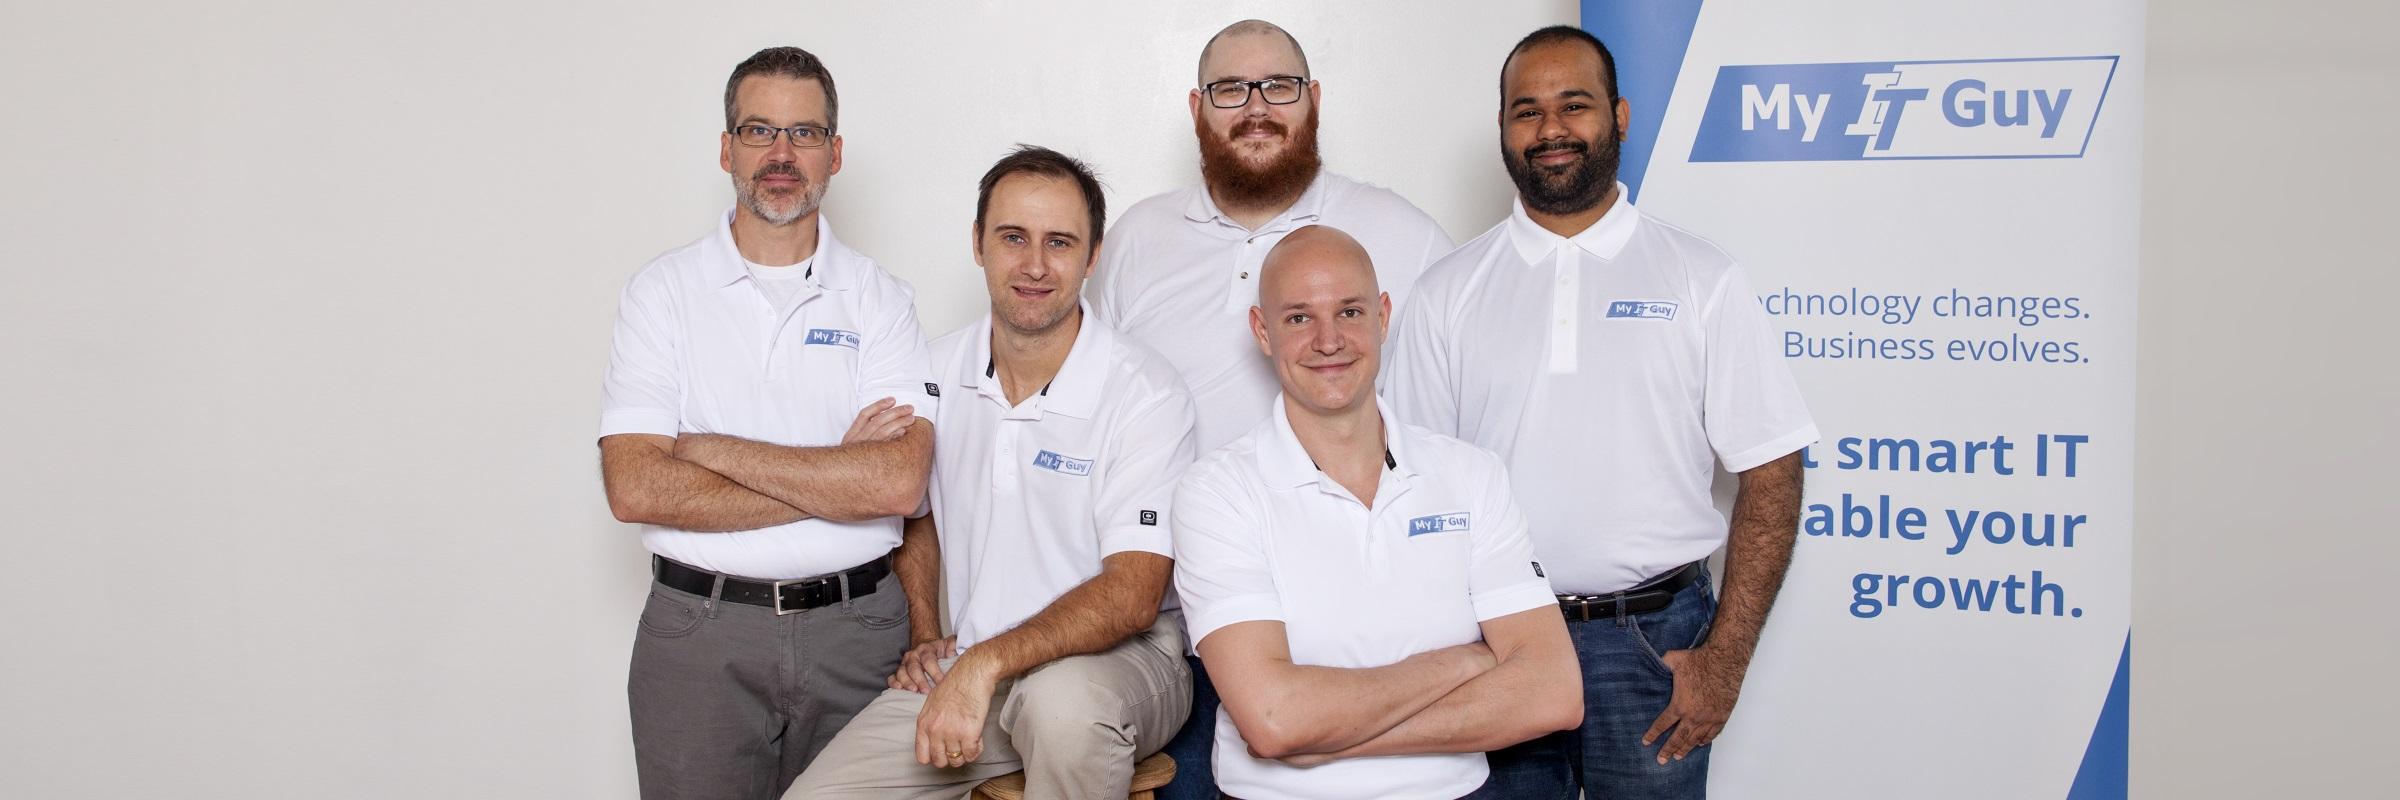 Group shot of all 5 My IT Guy team members